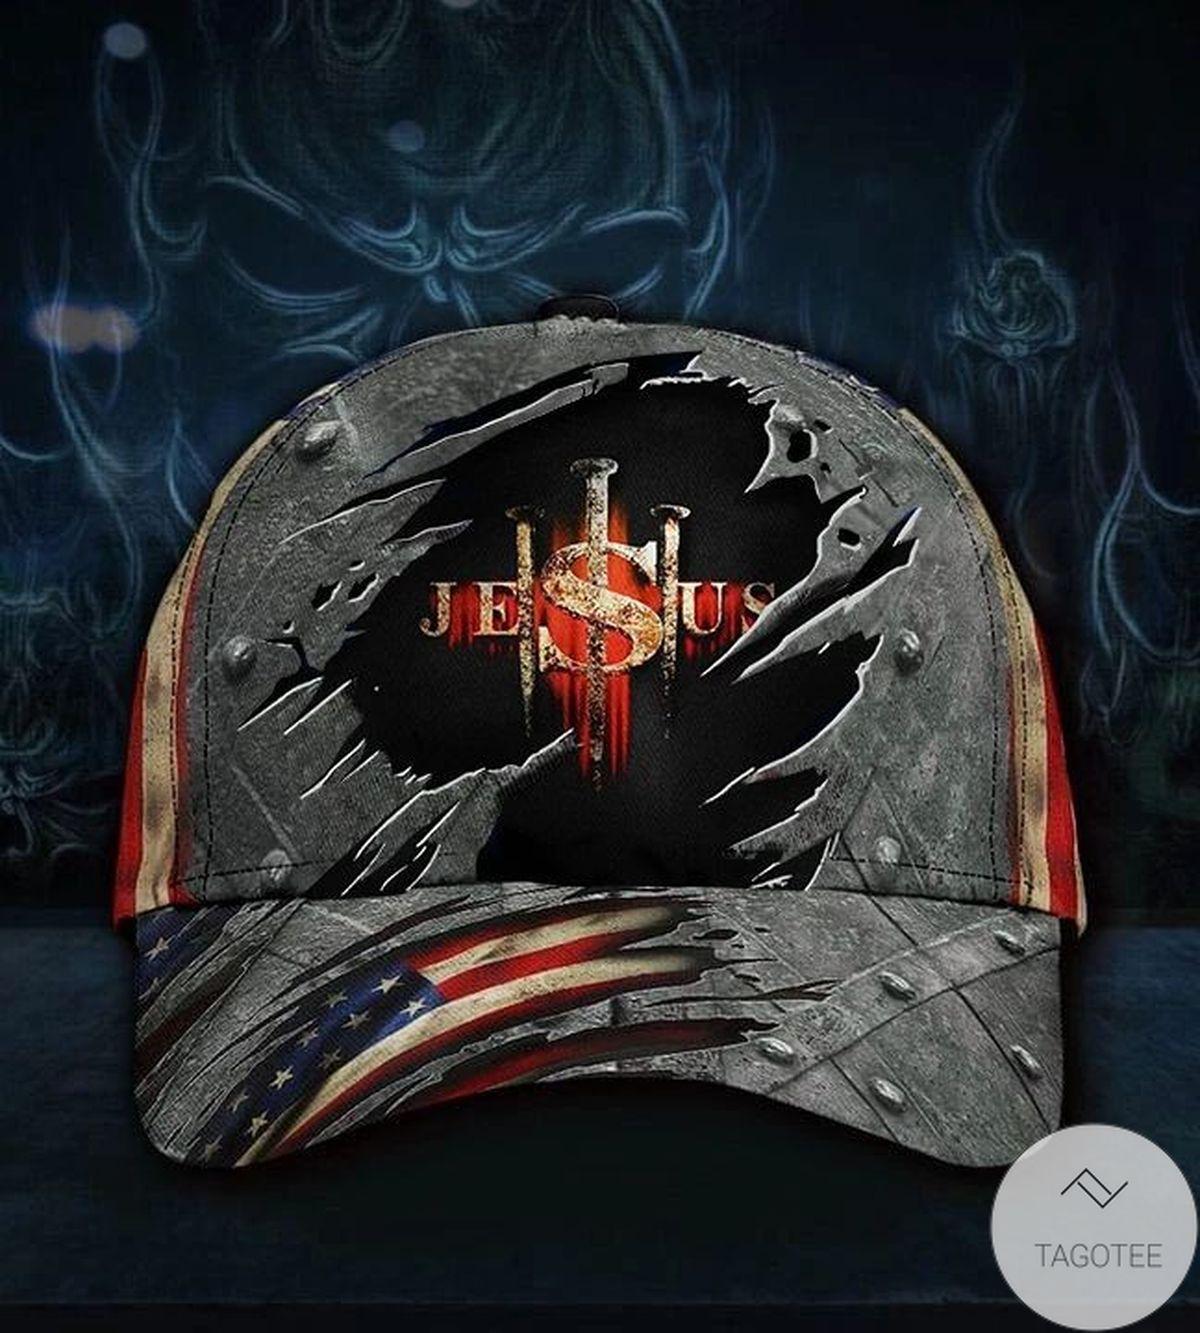 Jesus Hat 3D Printed American Flag Vintage Cap Men Patriotic Christian Gift For Him